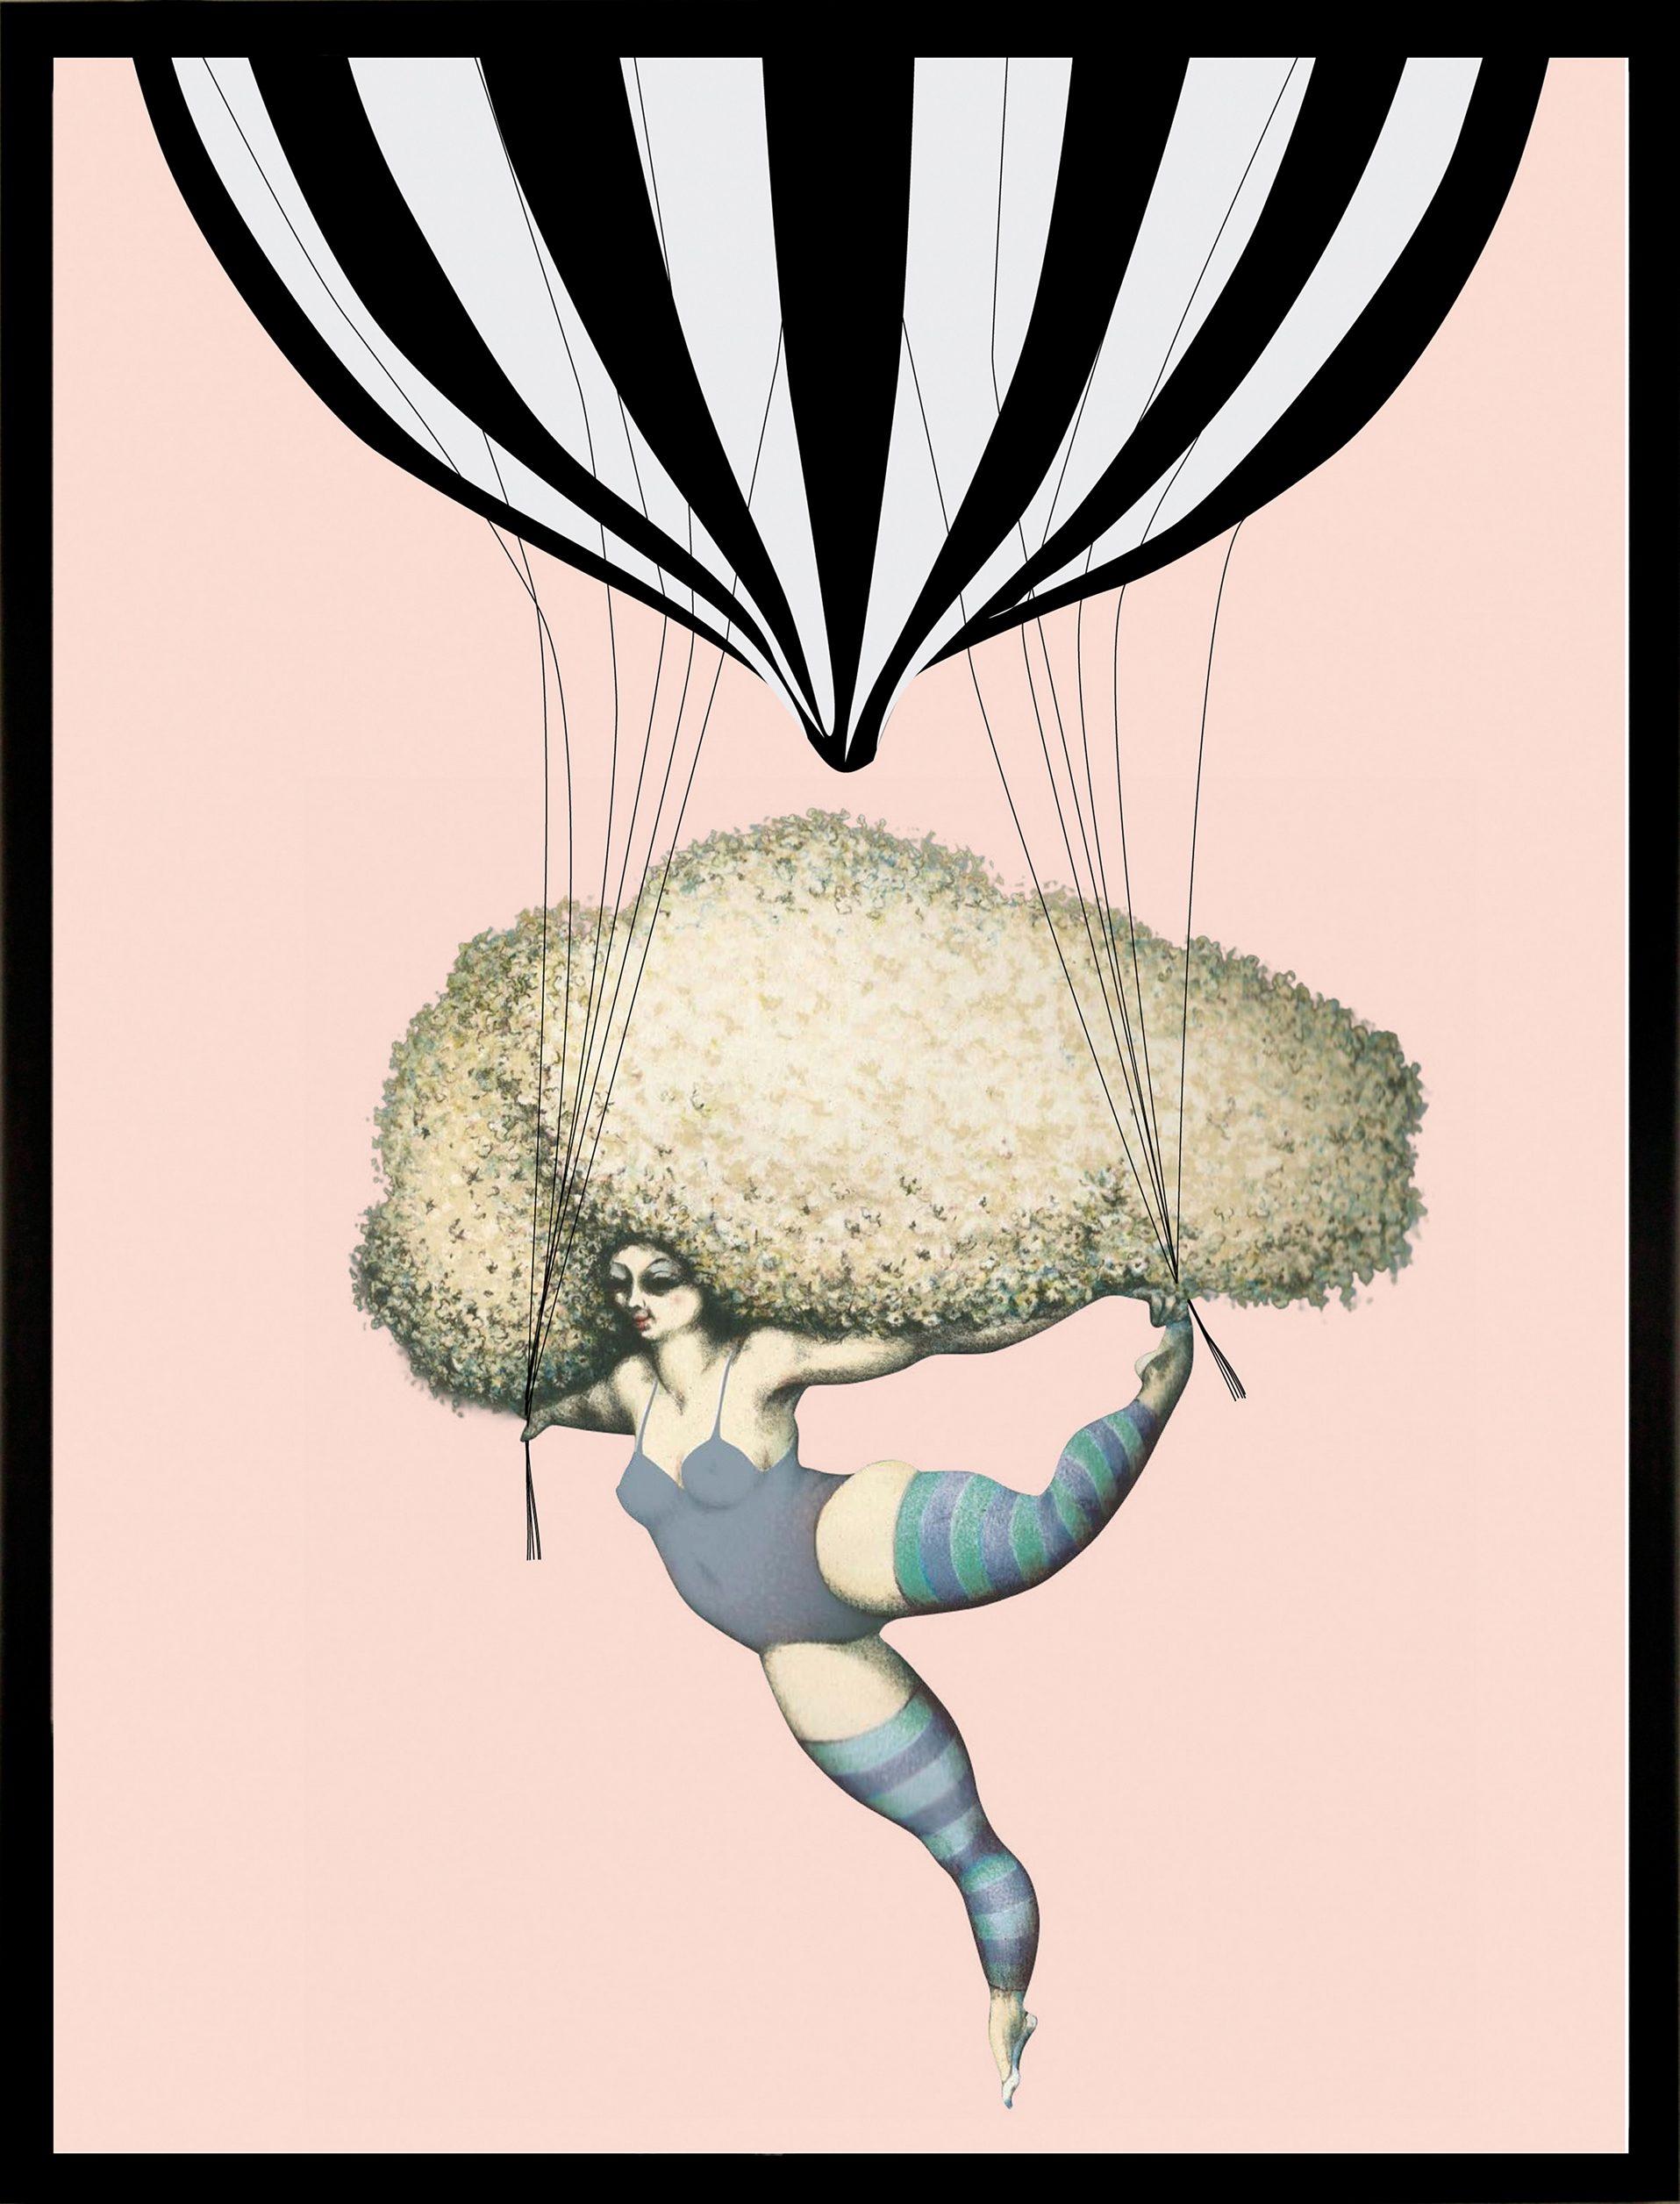 G&C gerahmter Kunstdruck »Dancing with Balloon« Luftballon, 33/43 c